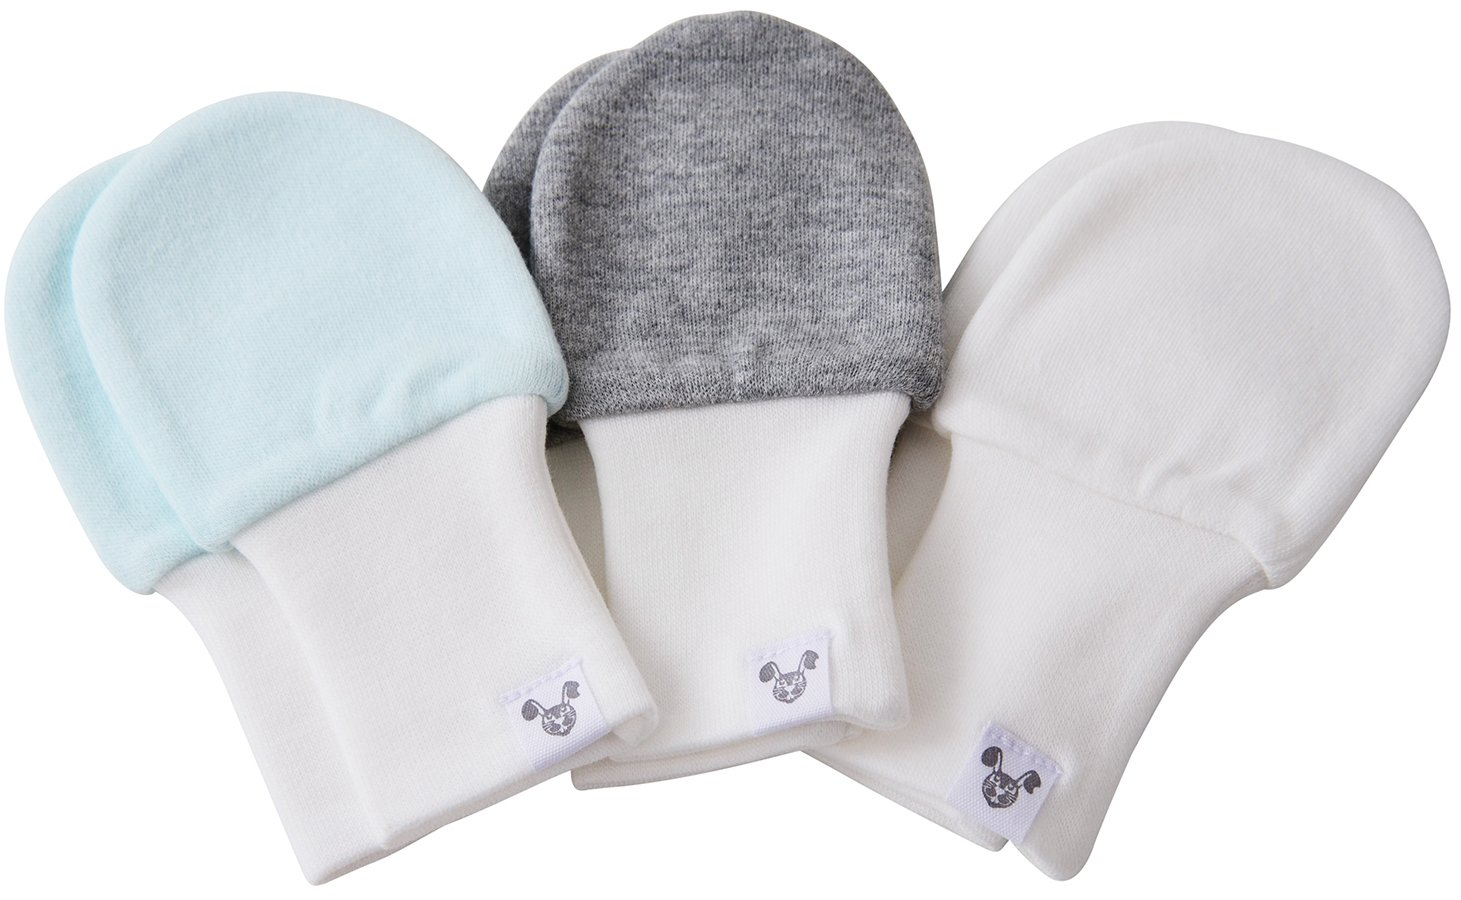 Newborn Baby Mittens - Blue, Grey and White, No